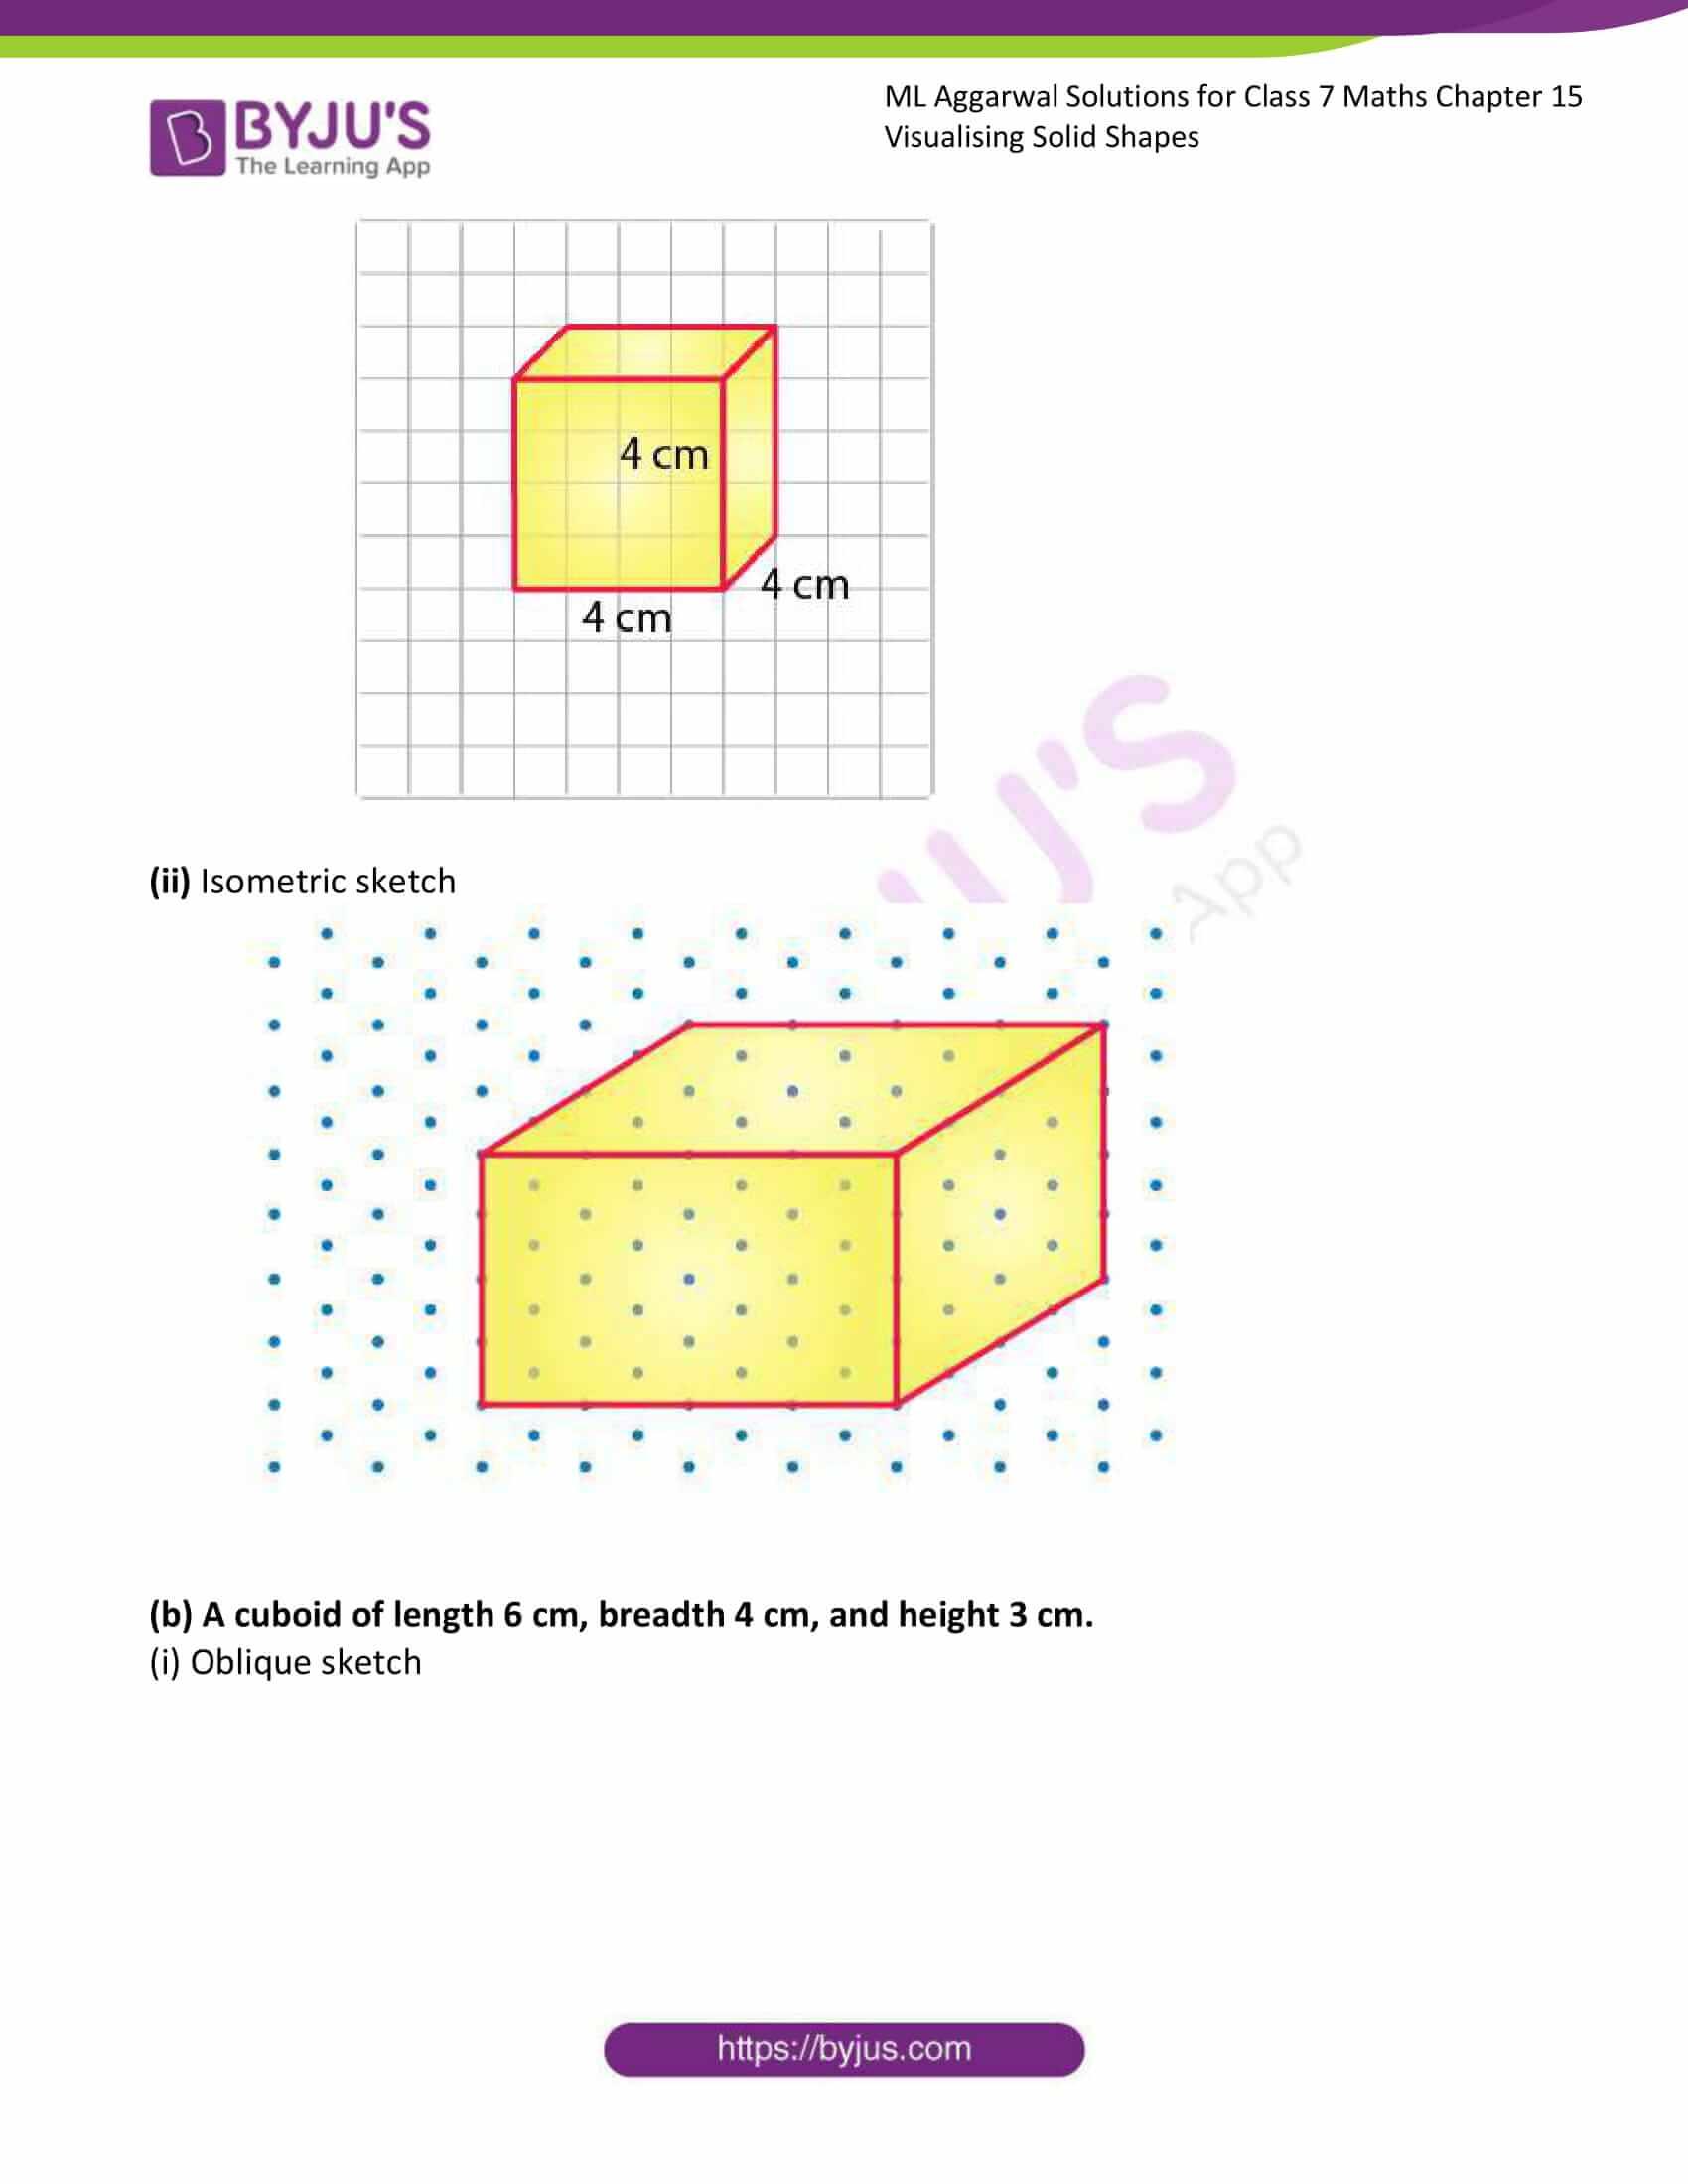 ml aggarwal sol class 7 maths chapter 15 10